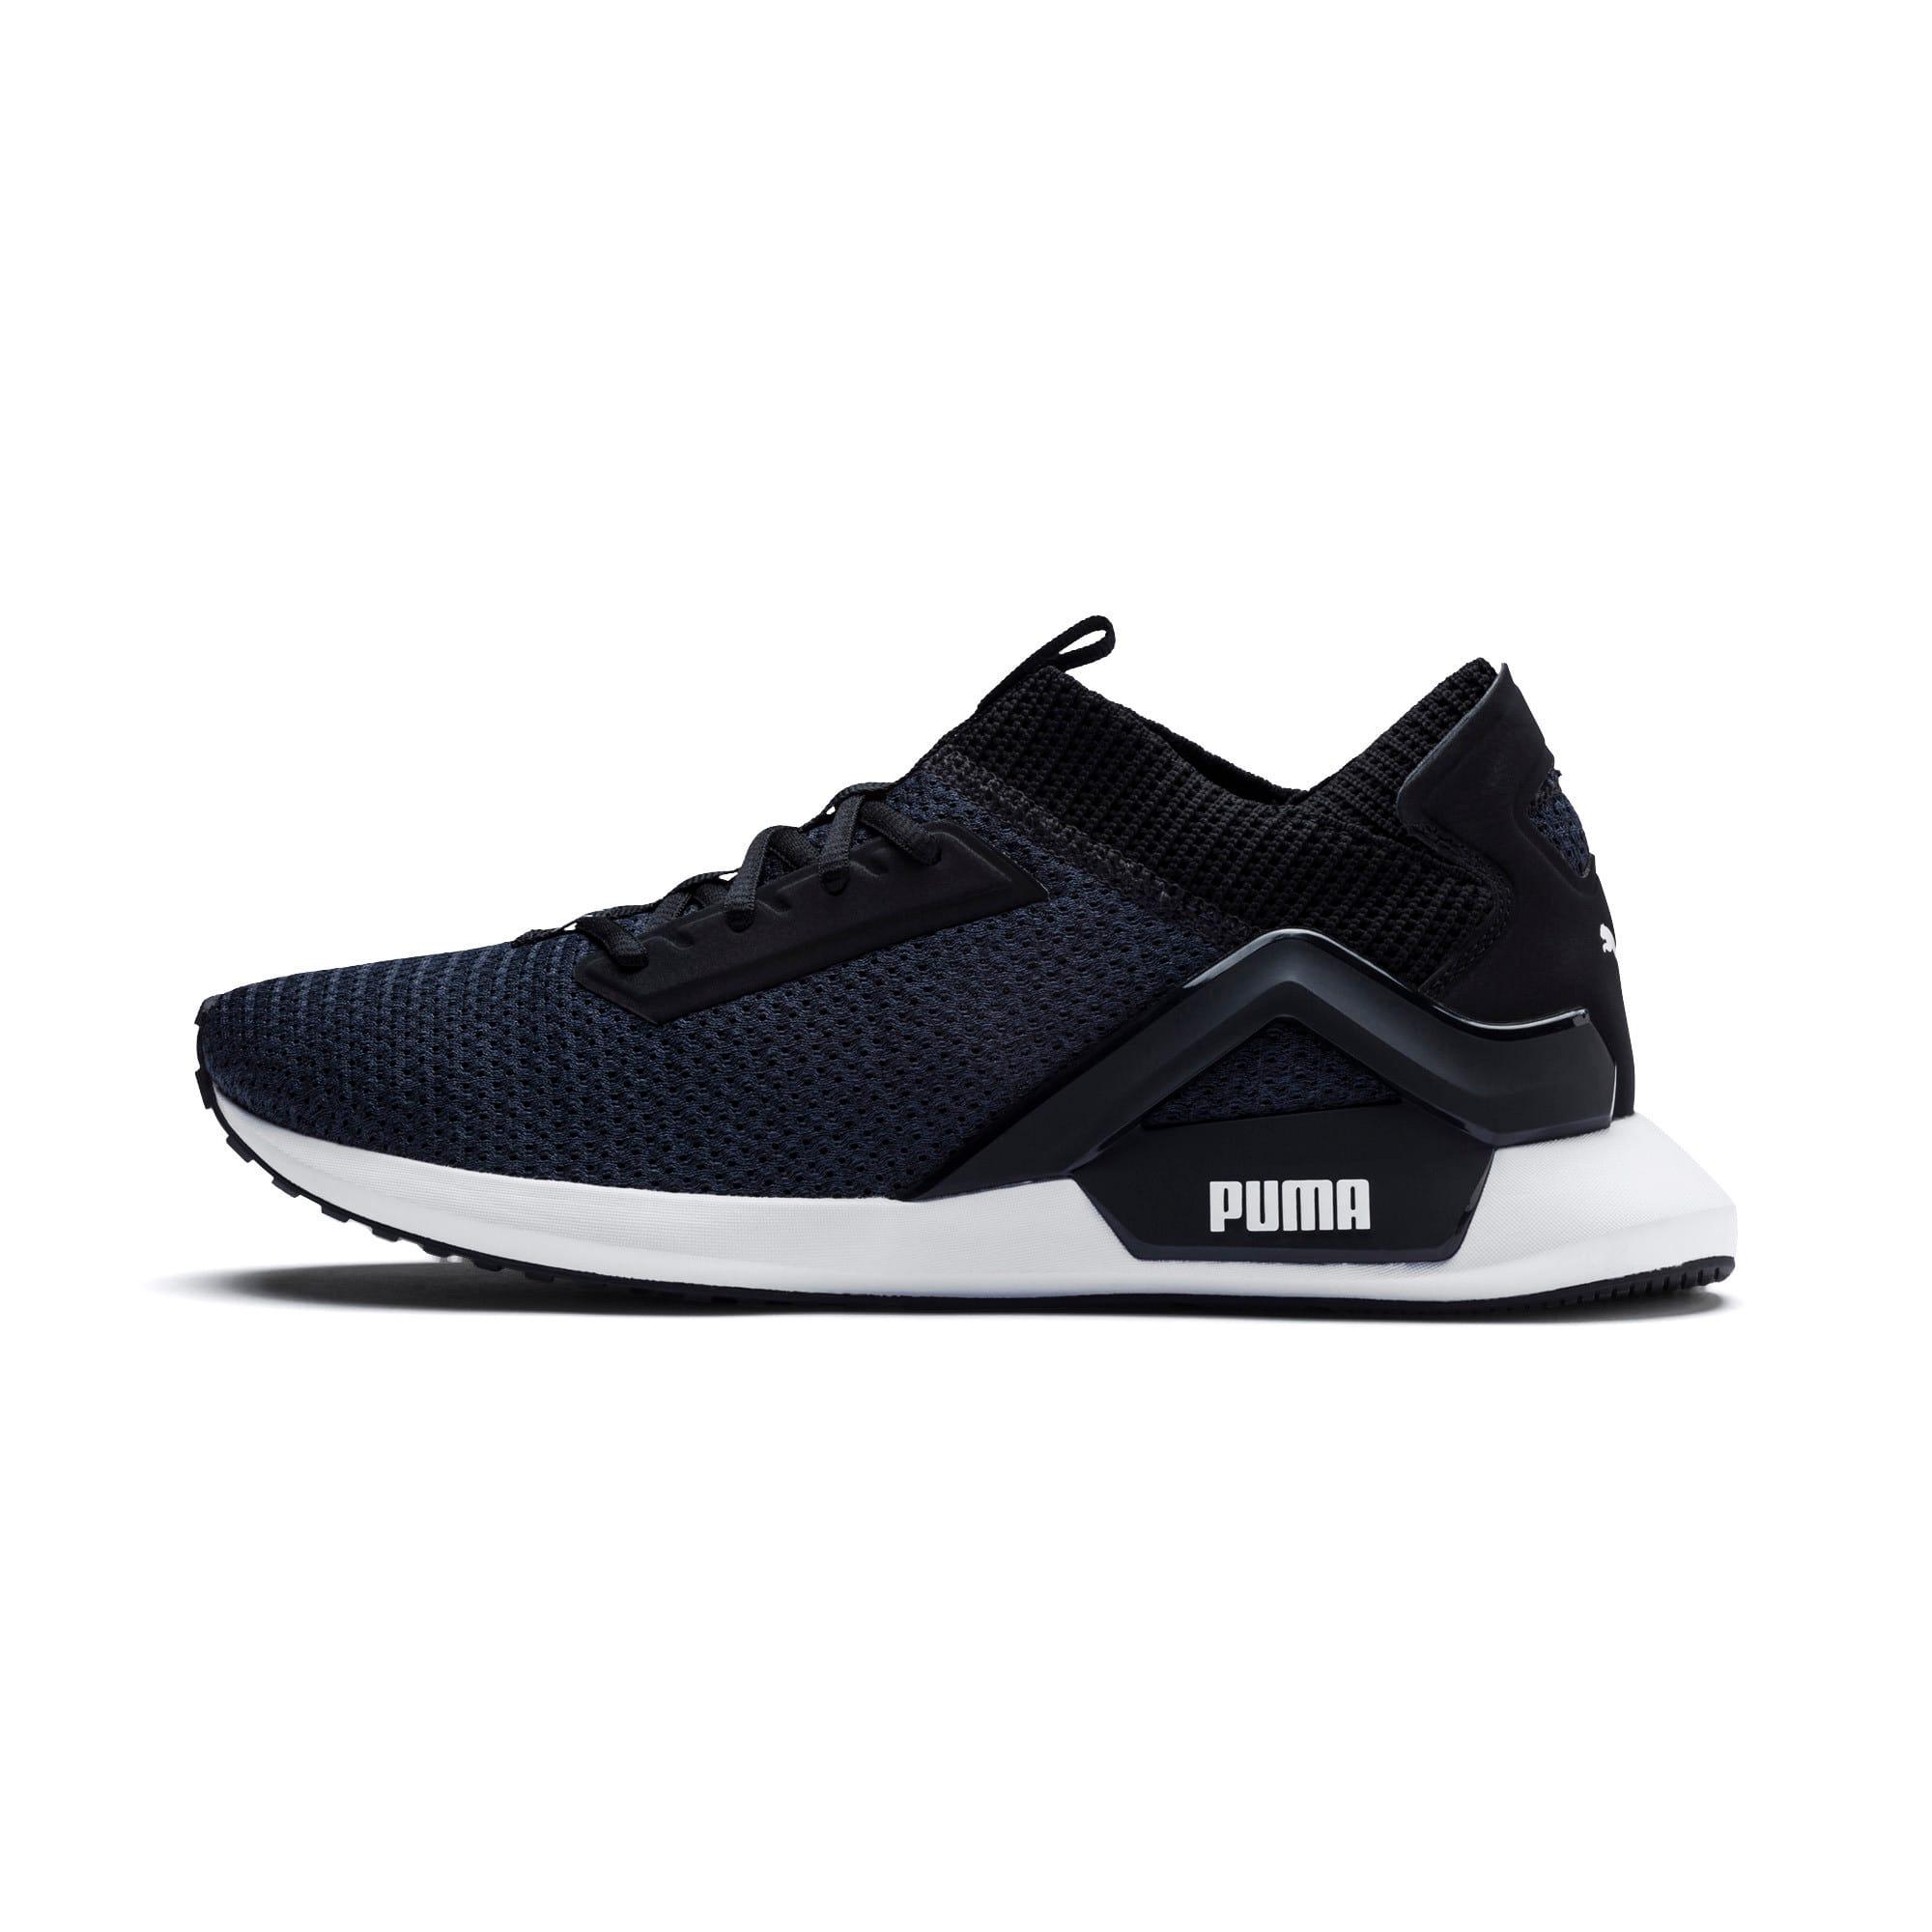 Thumbnail 1 of Rogue Men's Running Shoes, Puma Black, medium